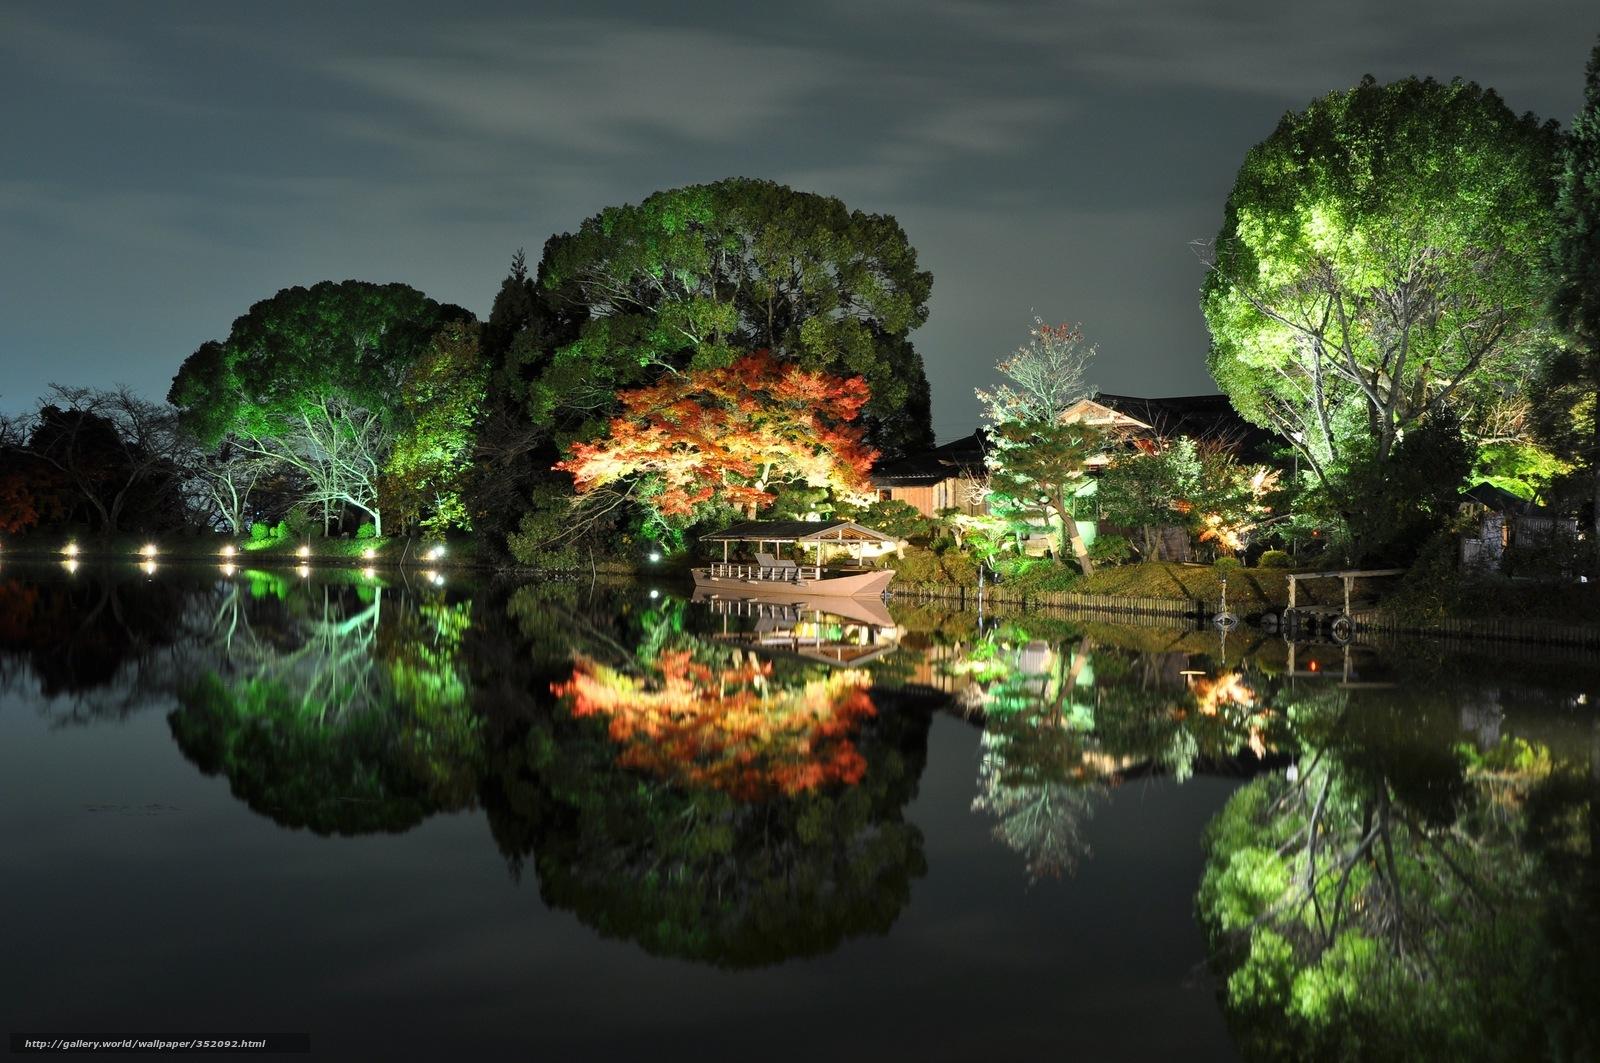 Download wallpaper japan autumn trees home free desktop for Home wallpaper japan